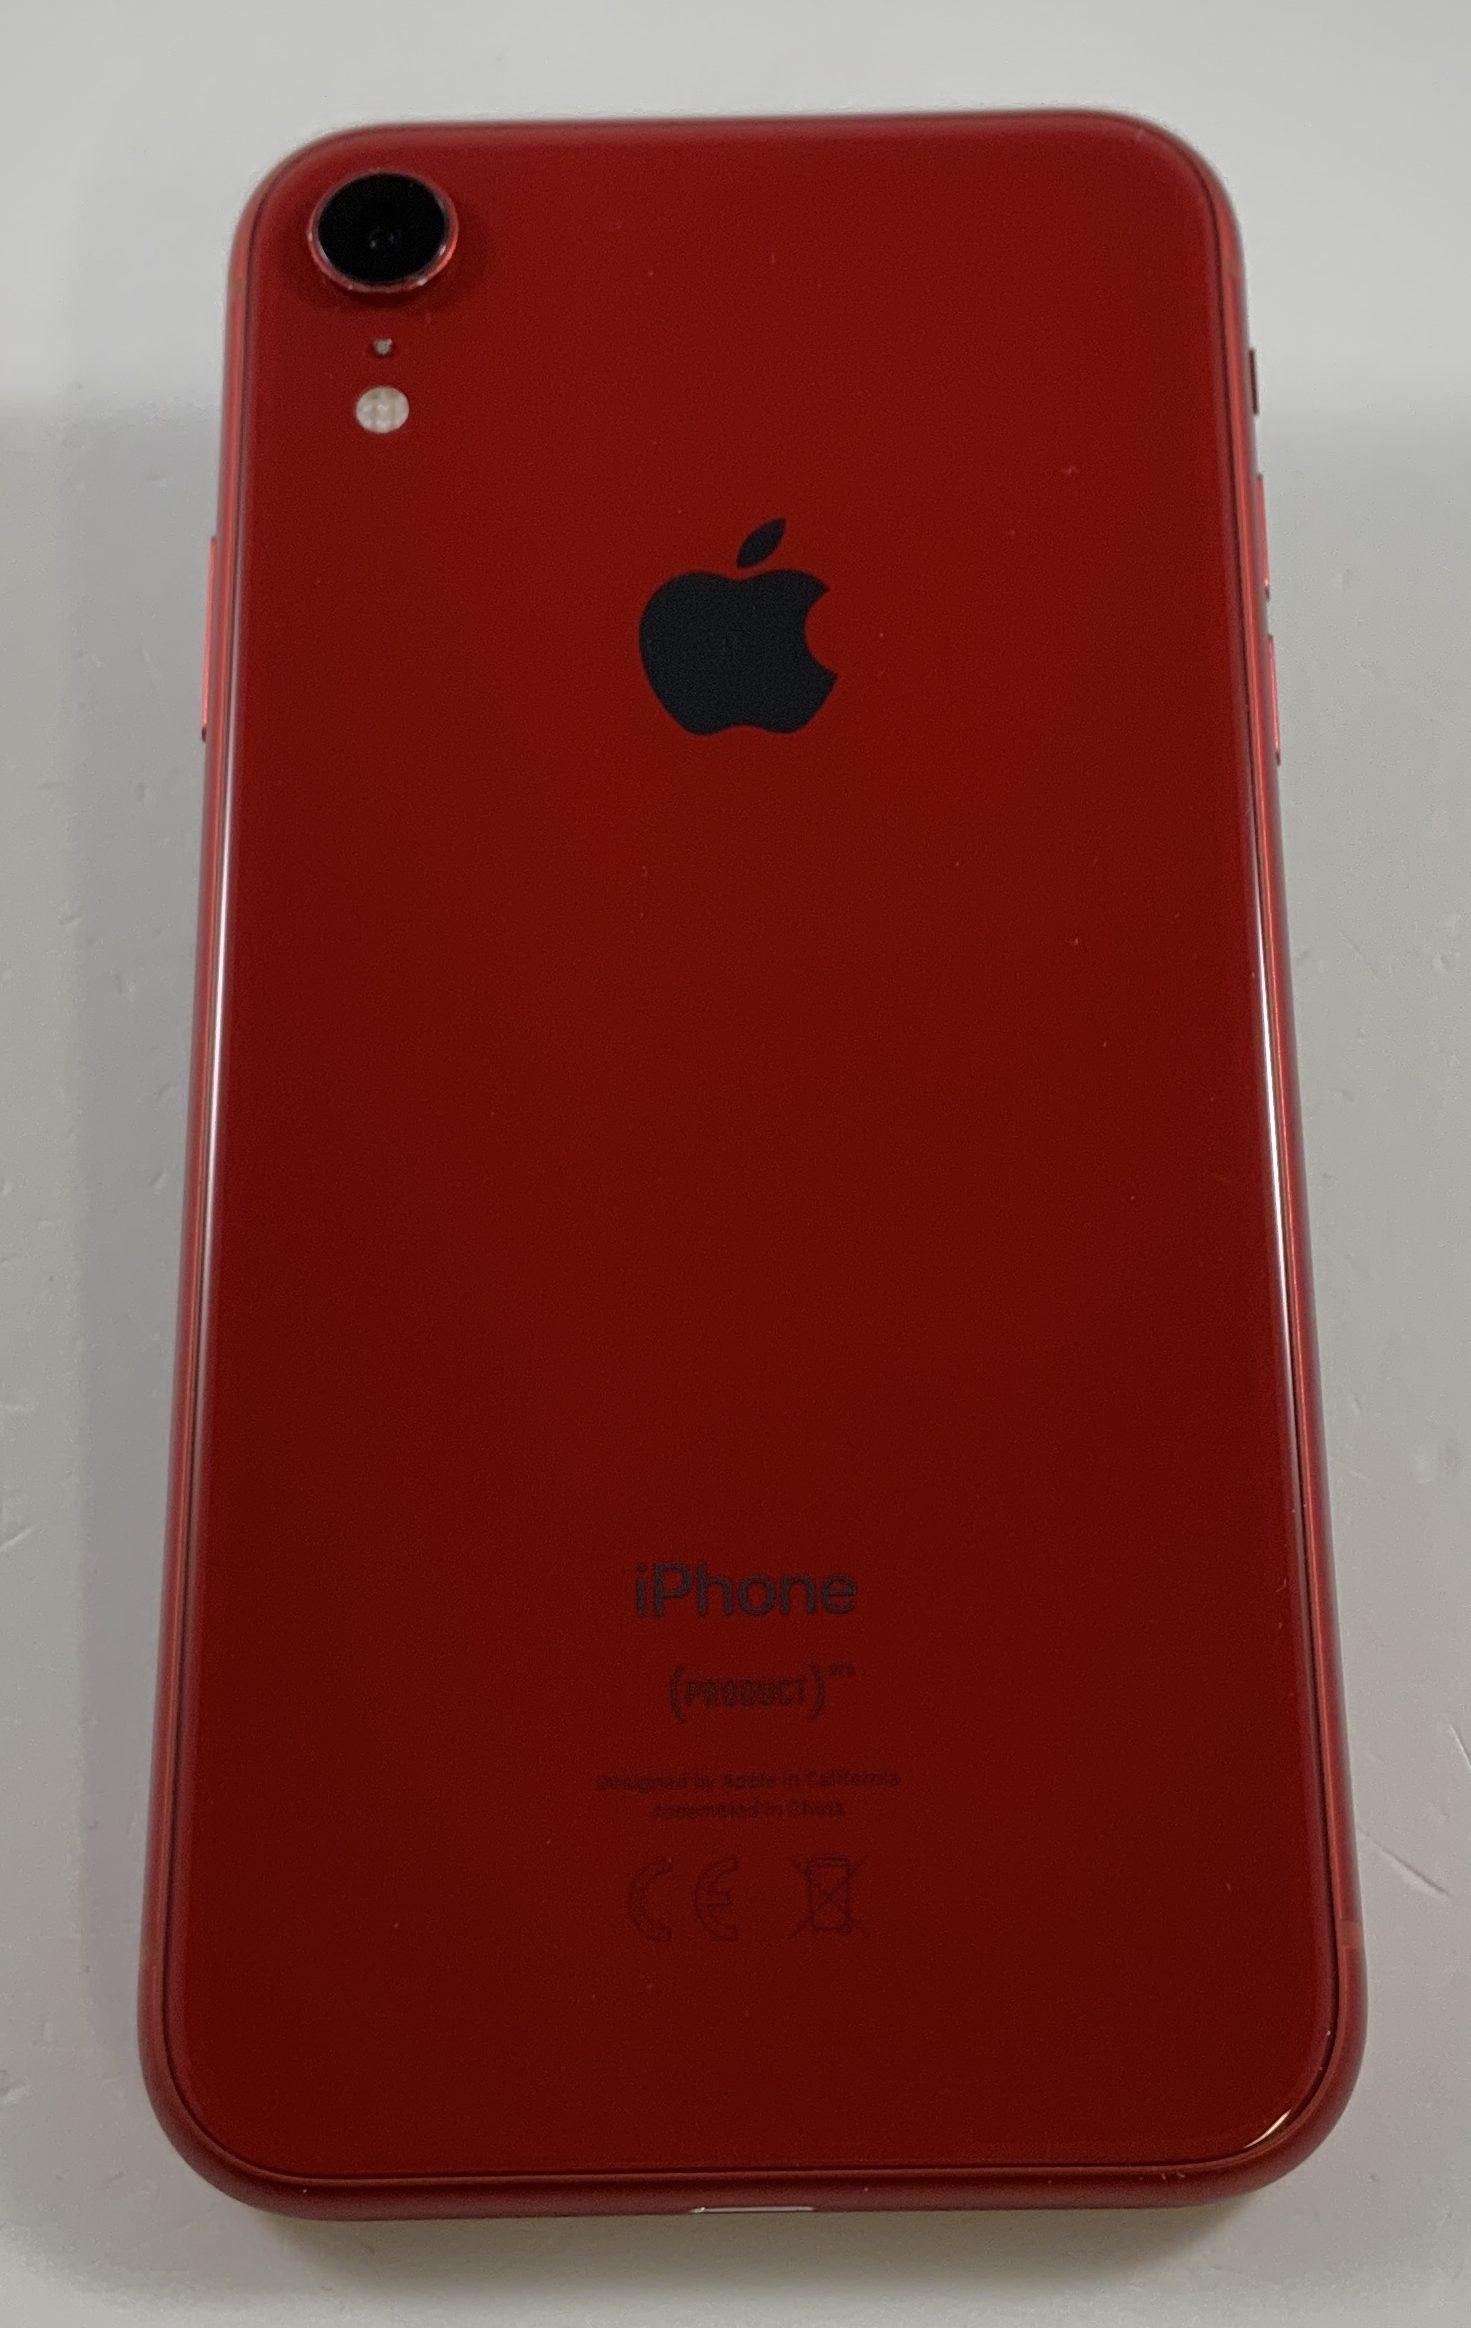 iPhone XR 64GB, 64GB, Red, immagine 2